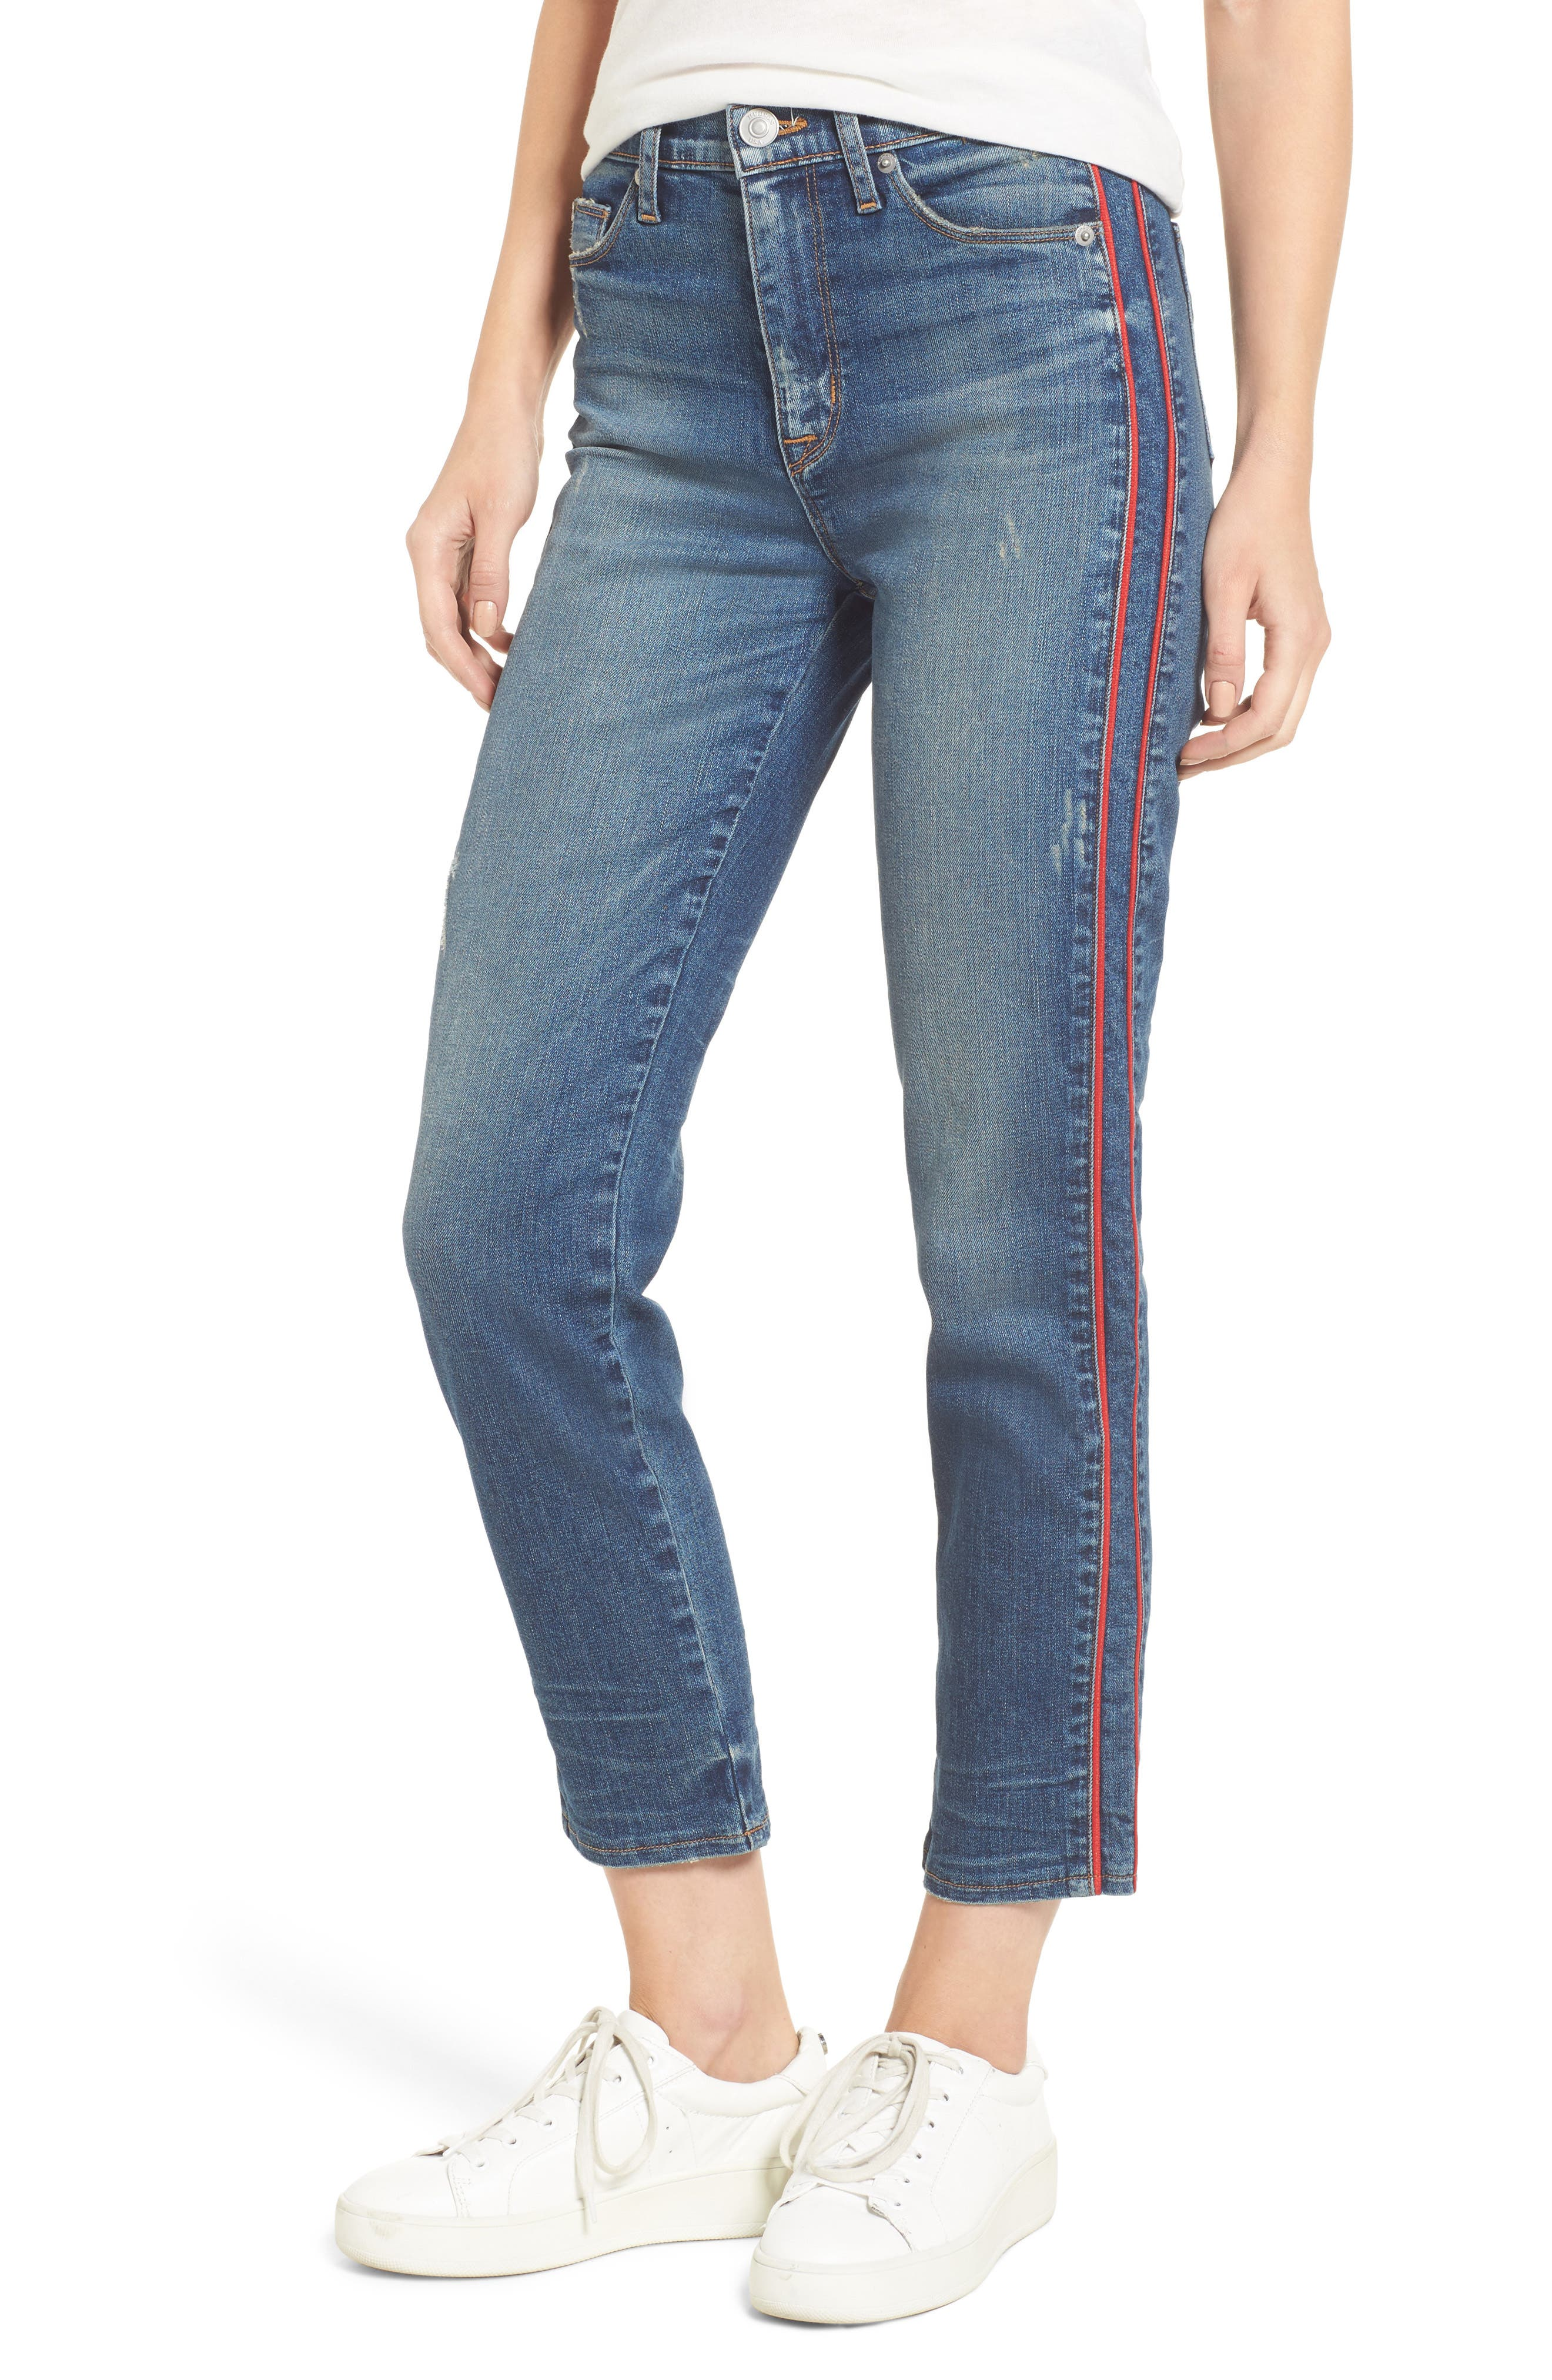 Zoeey High Waist Crop Jeans,                             Main thumbnail 1, color,                             460